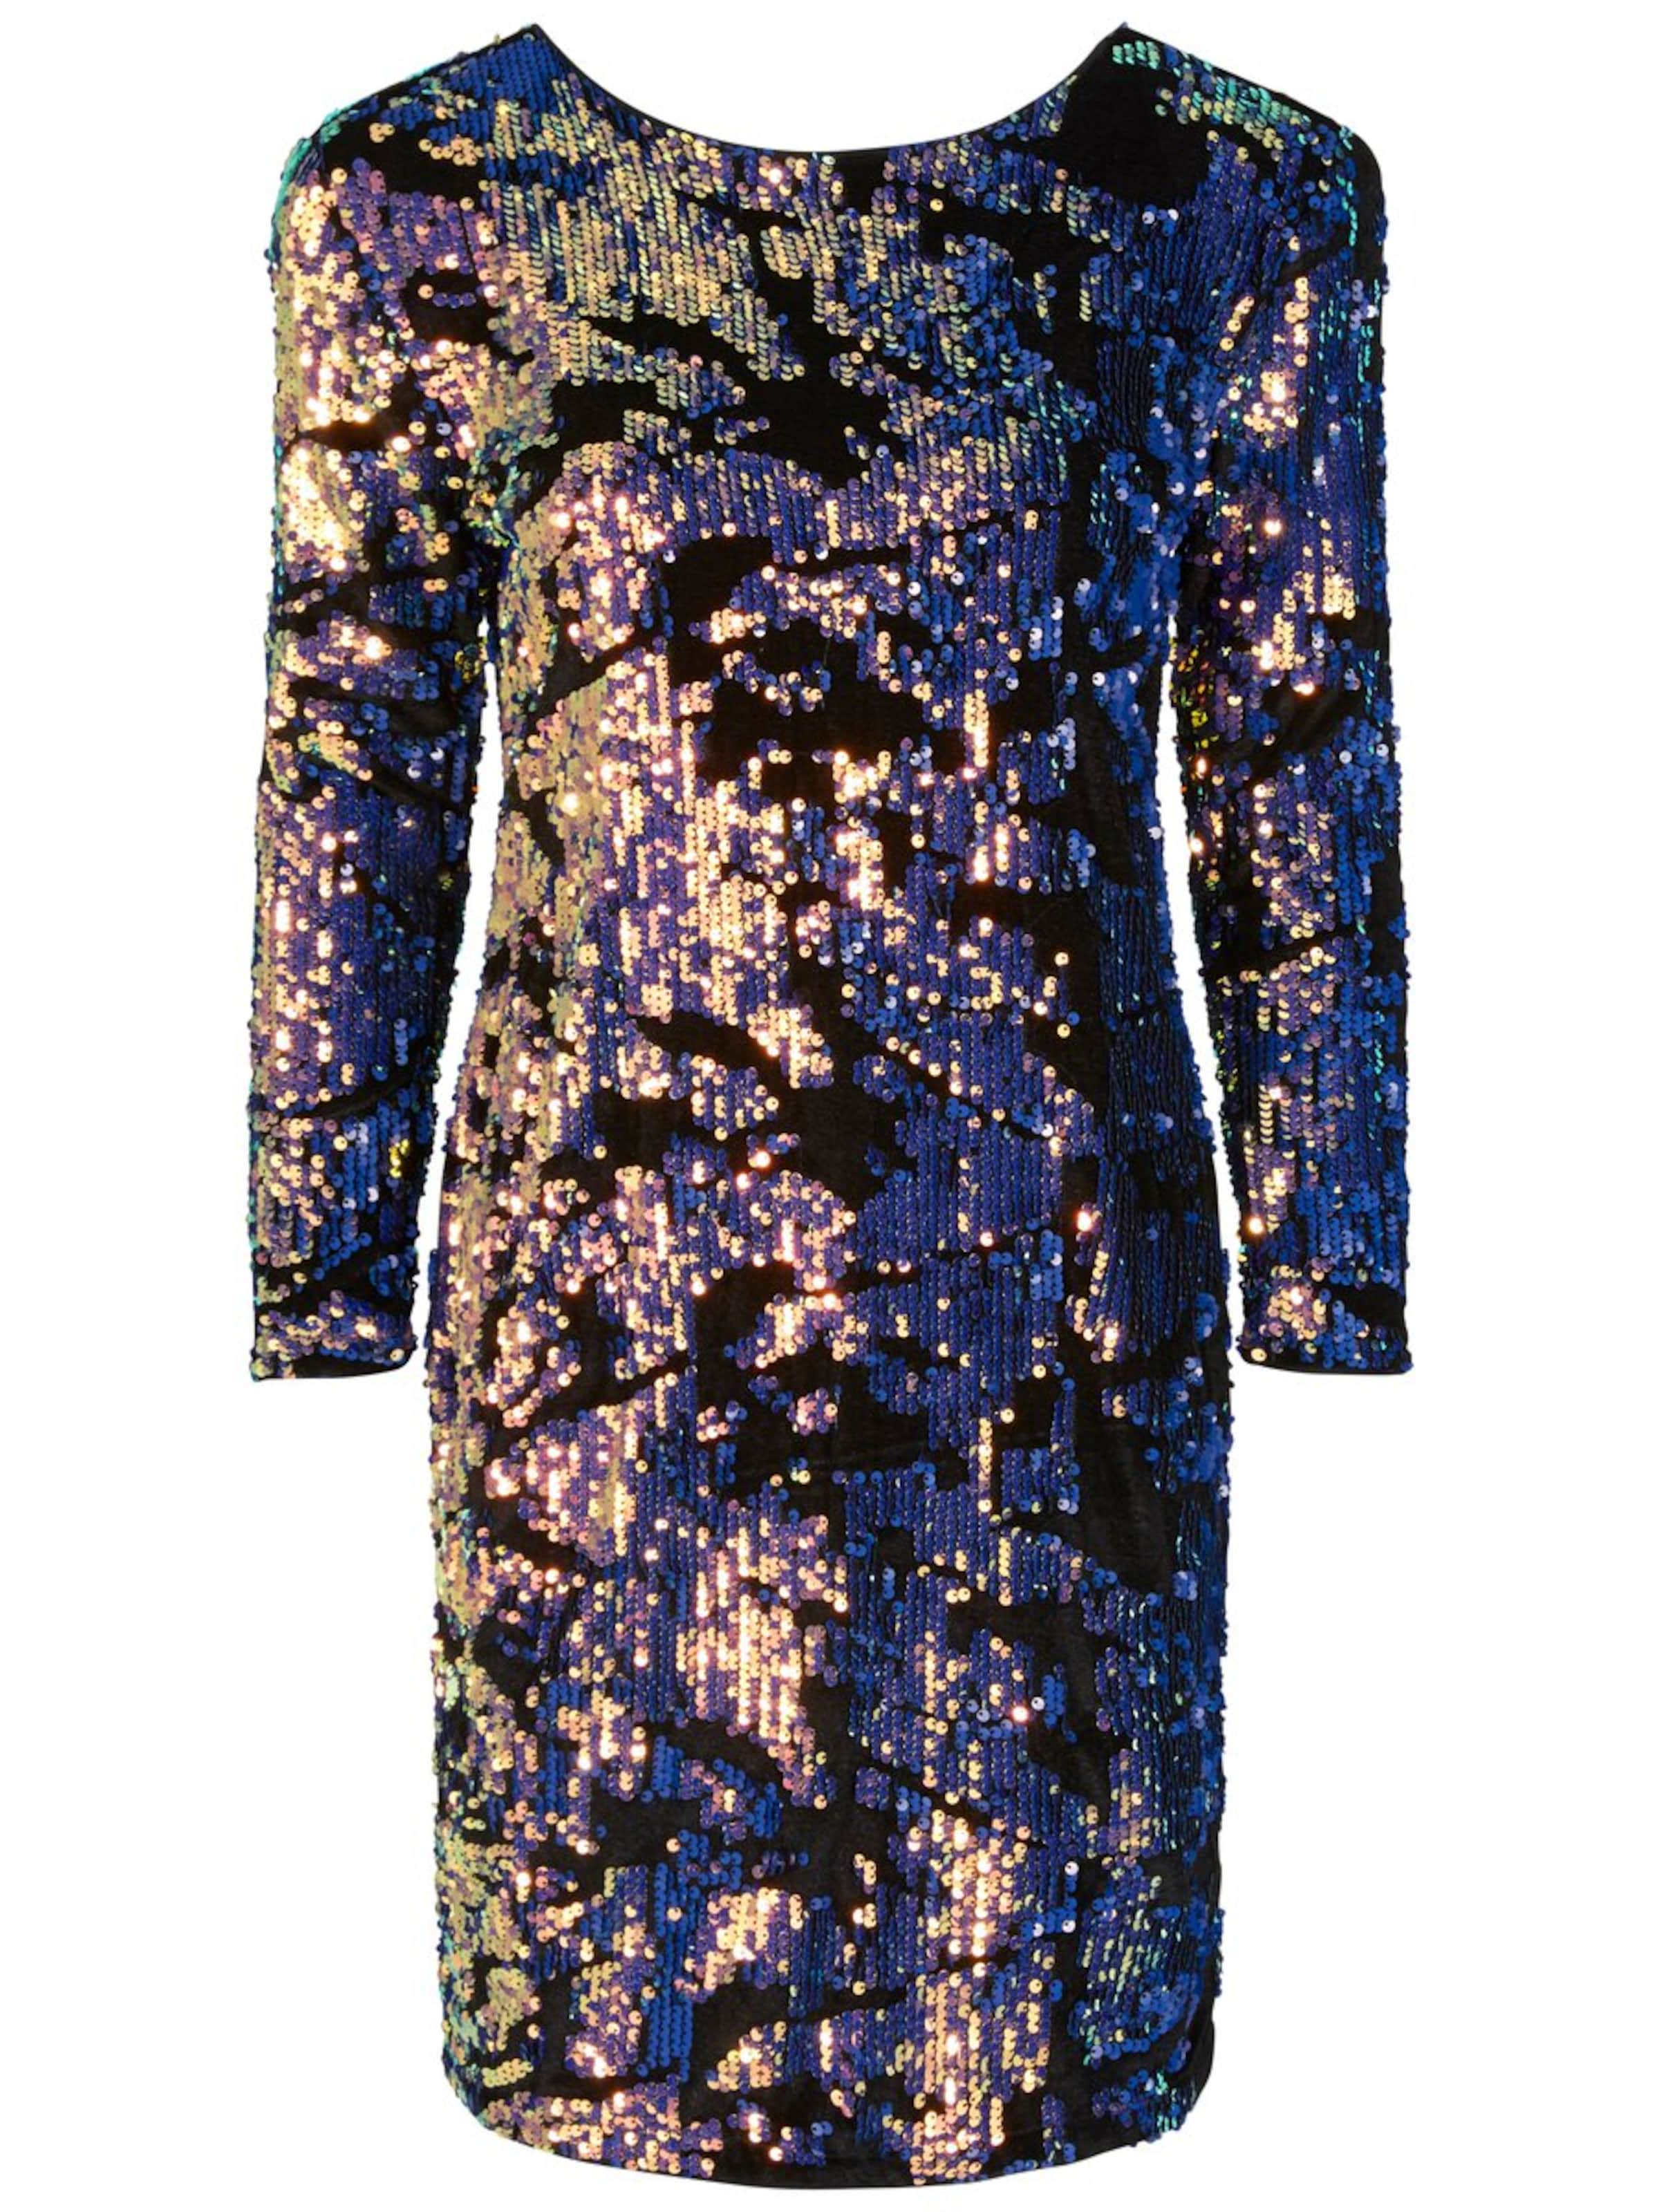 In a s 'hannah Kleid Y ViolettblauSchwarz Sequin' SVqzpGjLUM